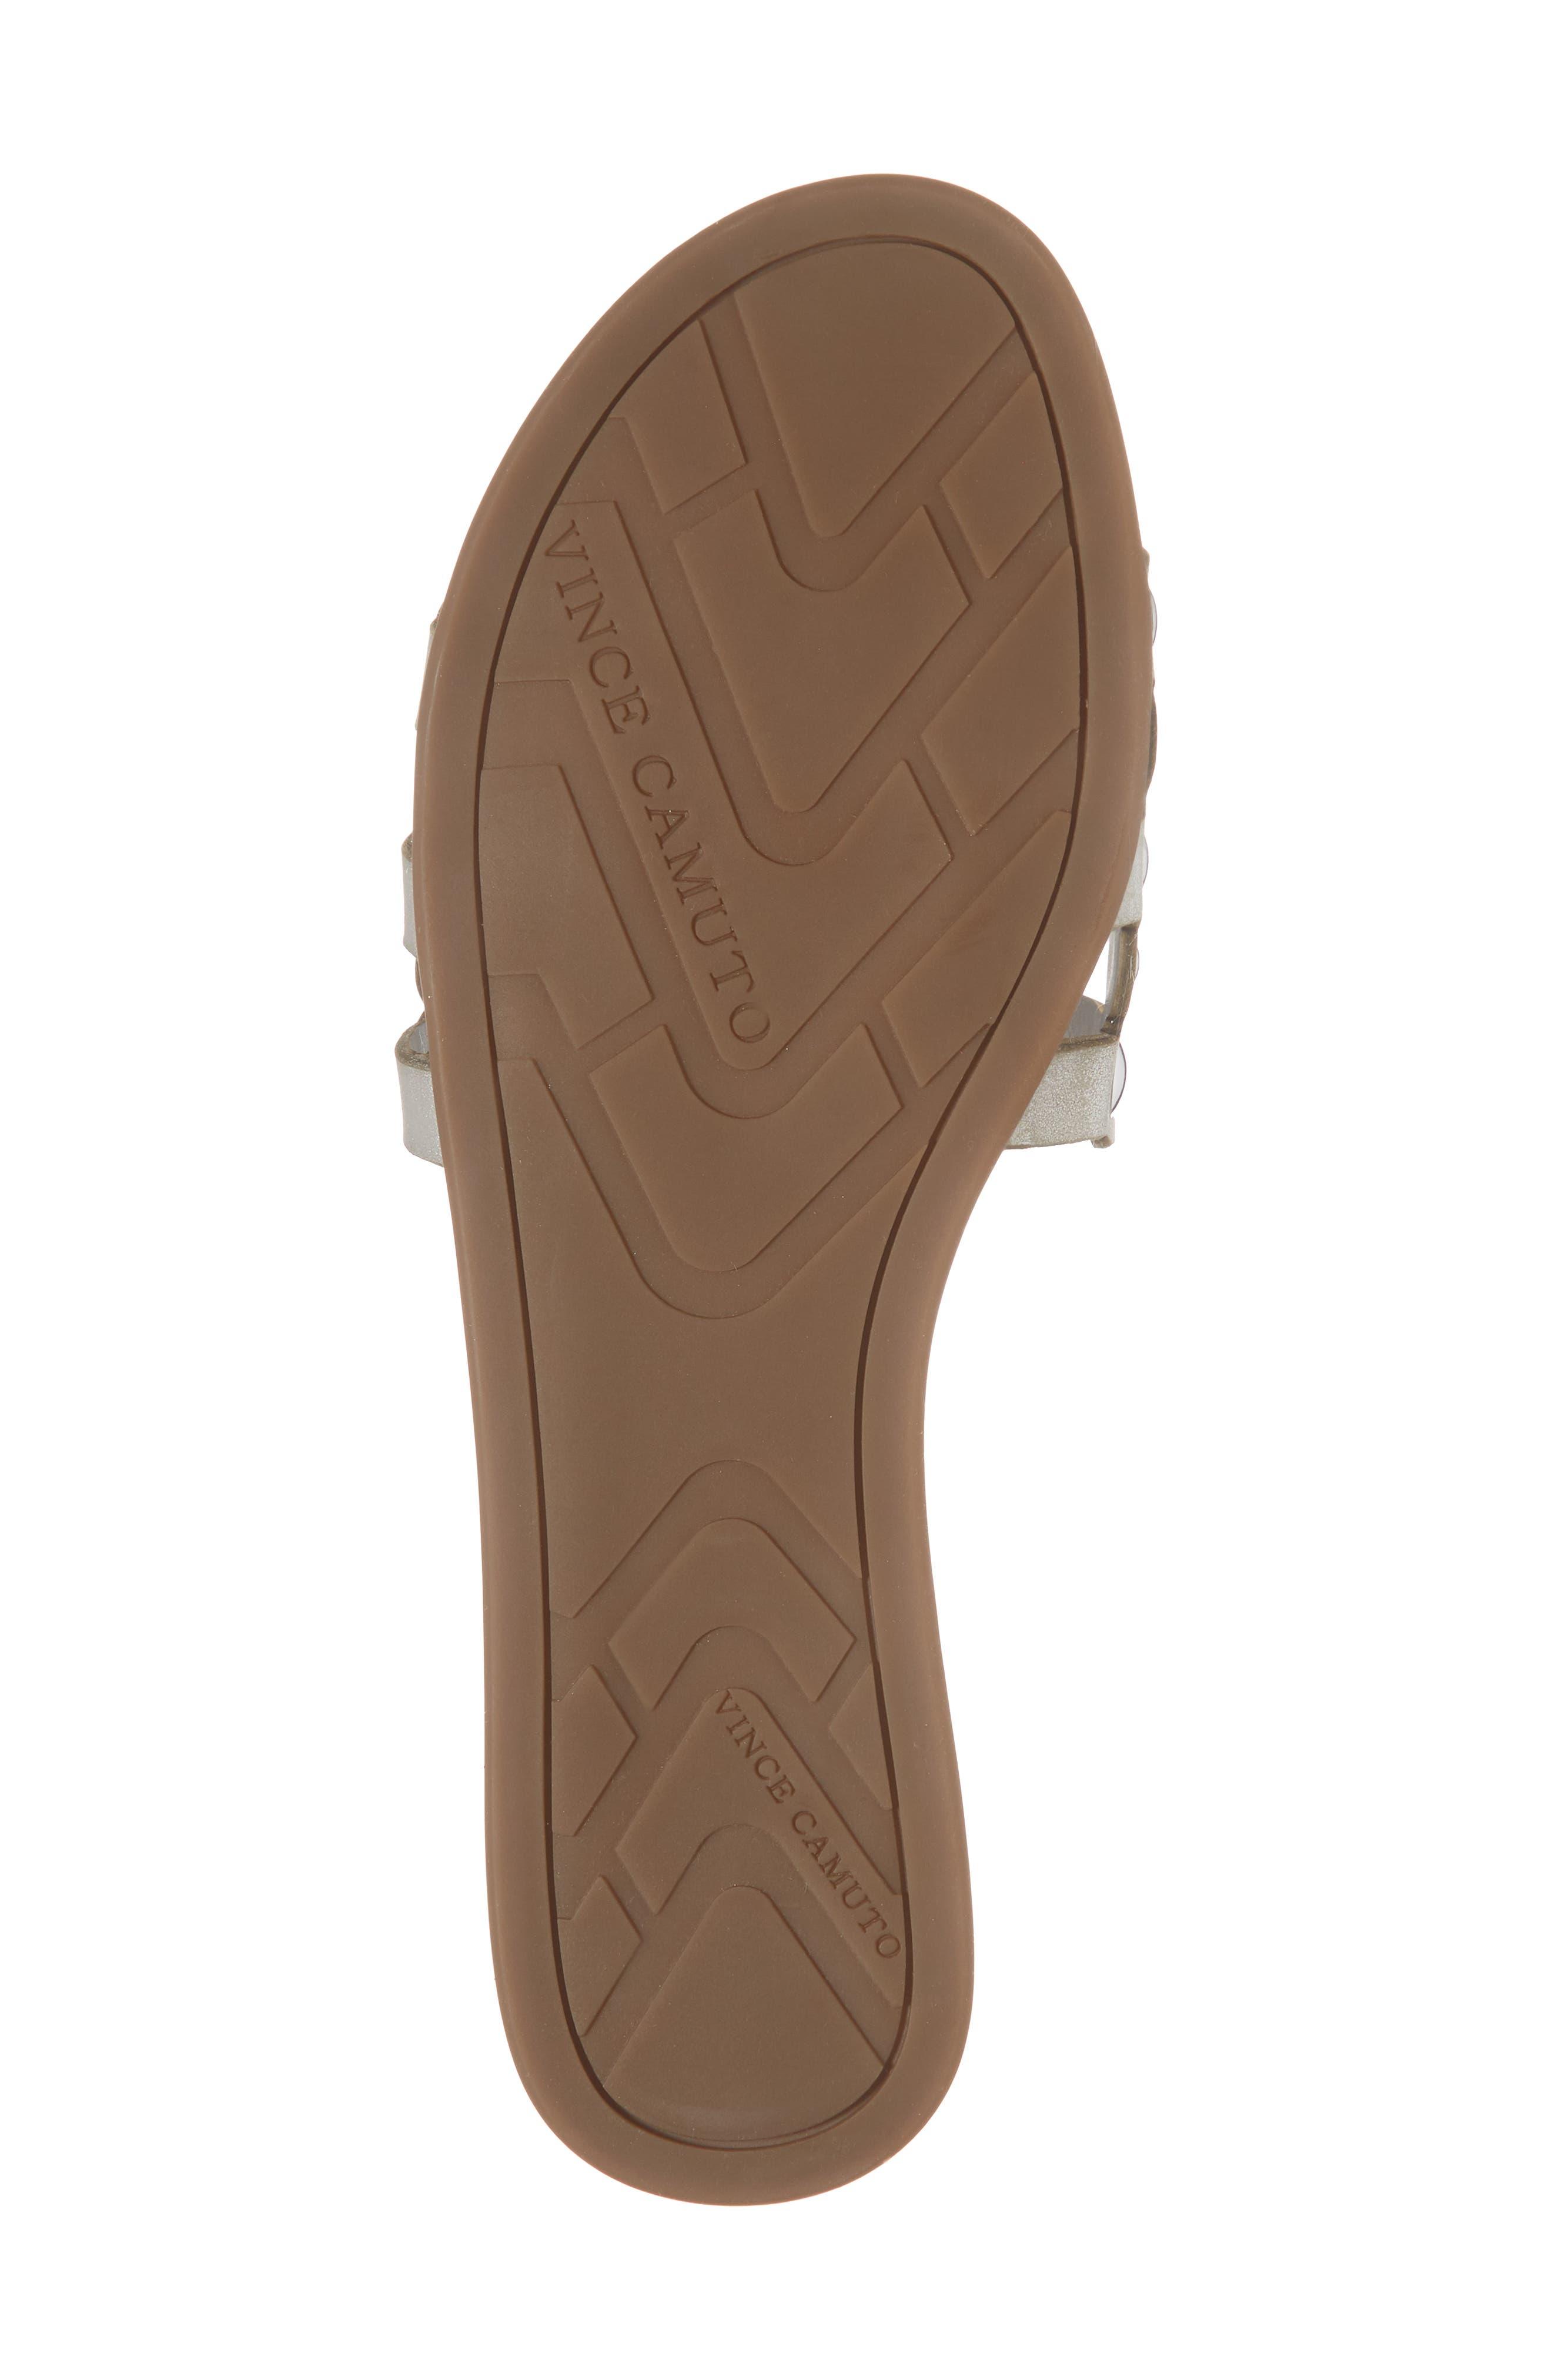 Ellanna Studded Slide Sandal,                             Alternate thumbnail 6, color,                             GLEAMING SILVER LEATHER